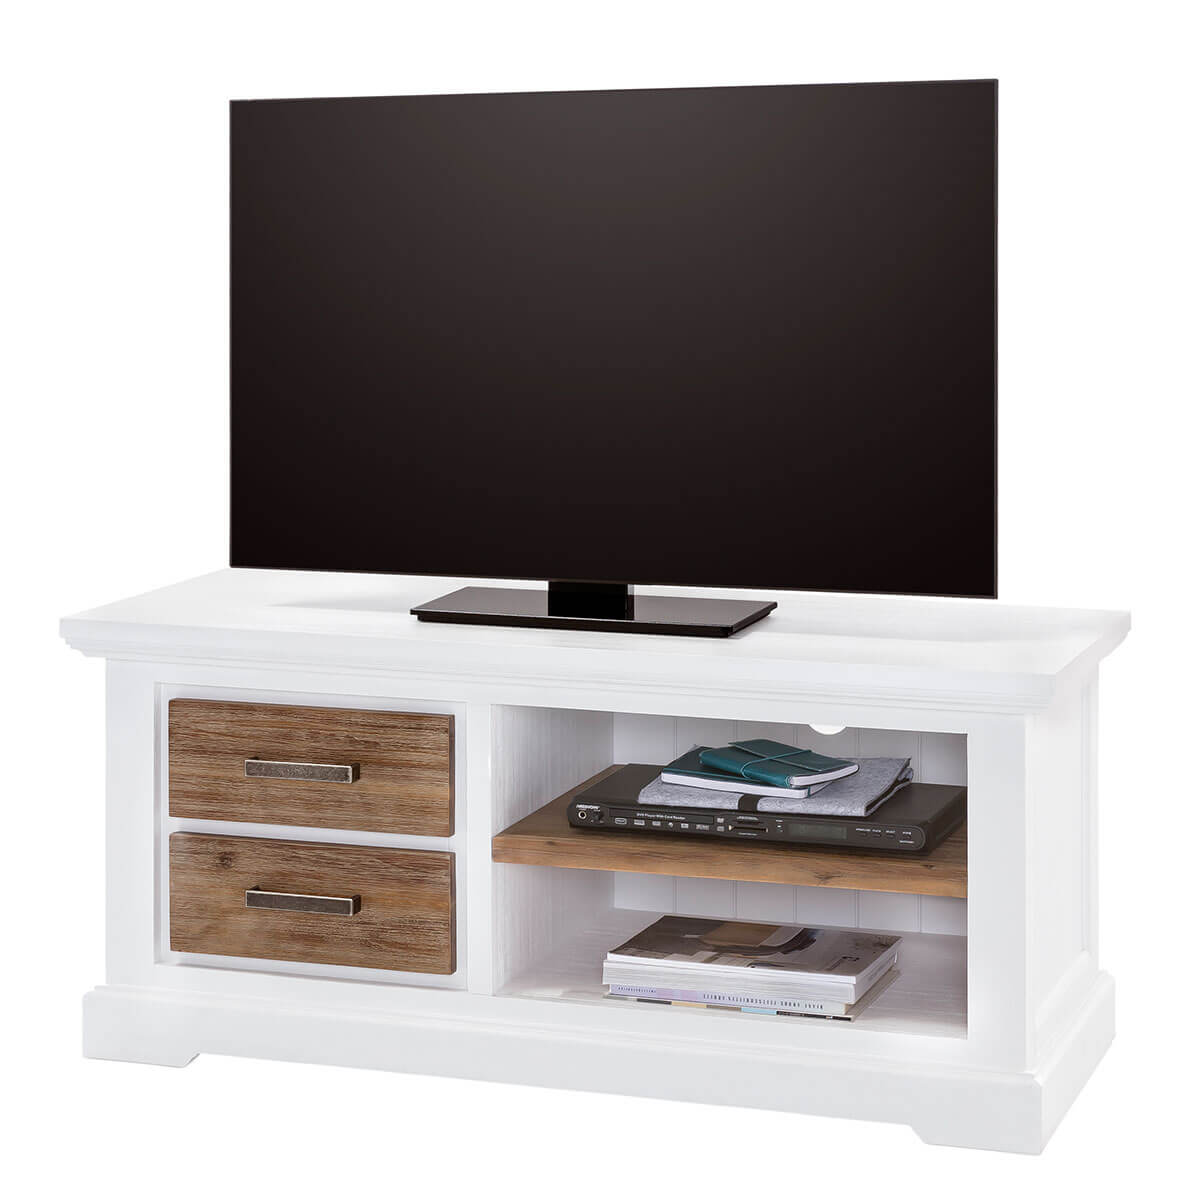 tv-lowboard-lale-in-wei-braun-120cm-breit